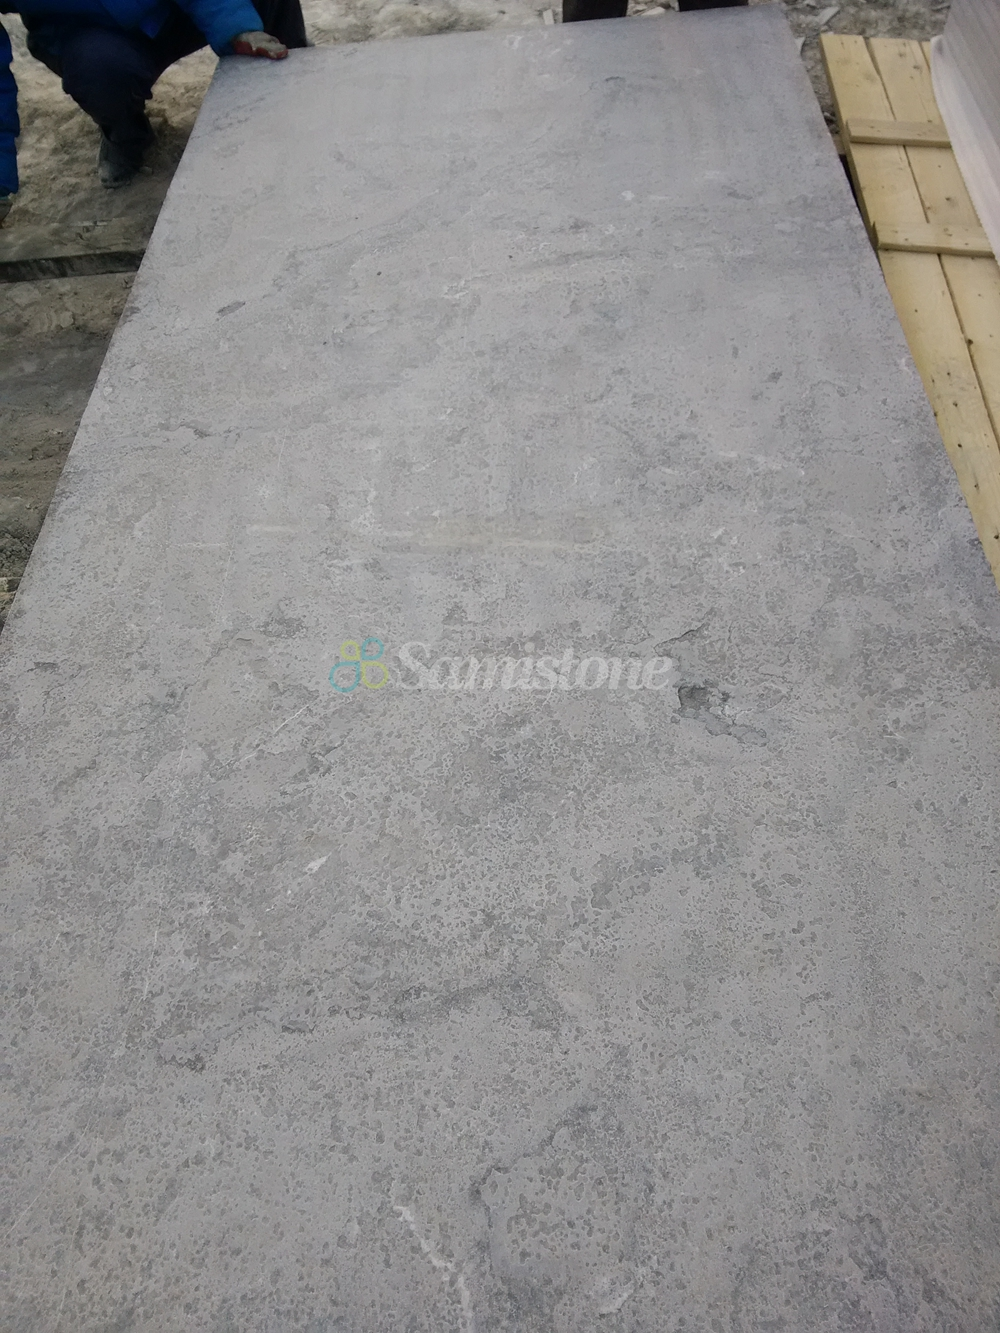 Samistone bluestone flamed & brushed slabs countertops